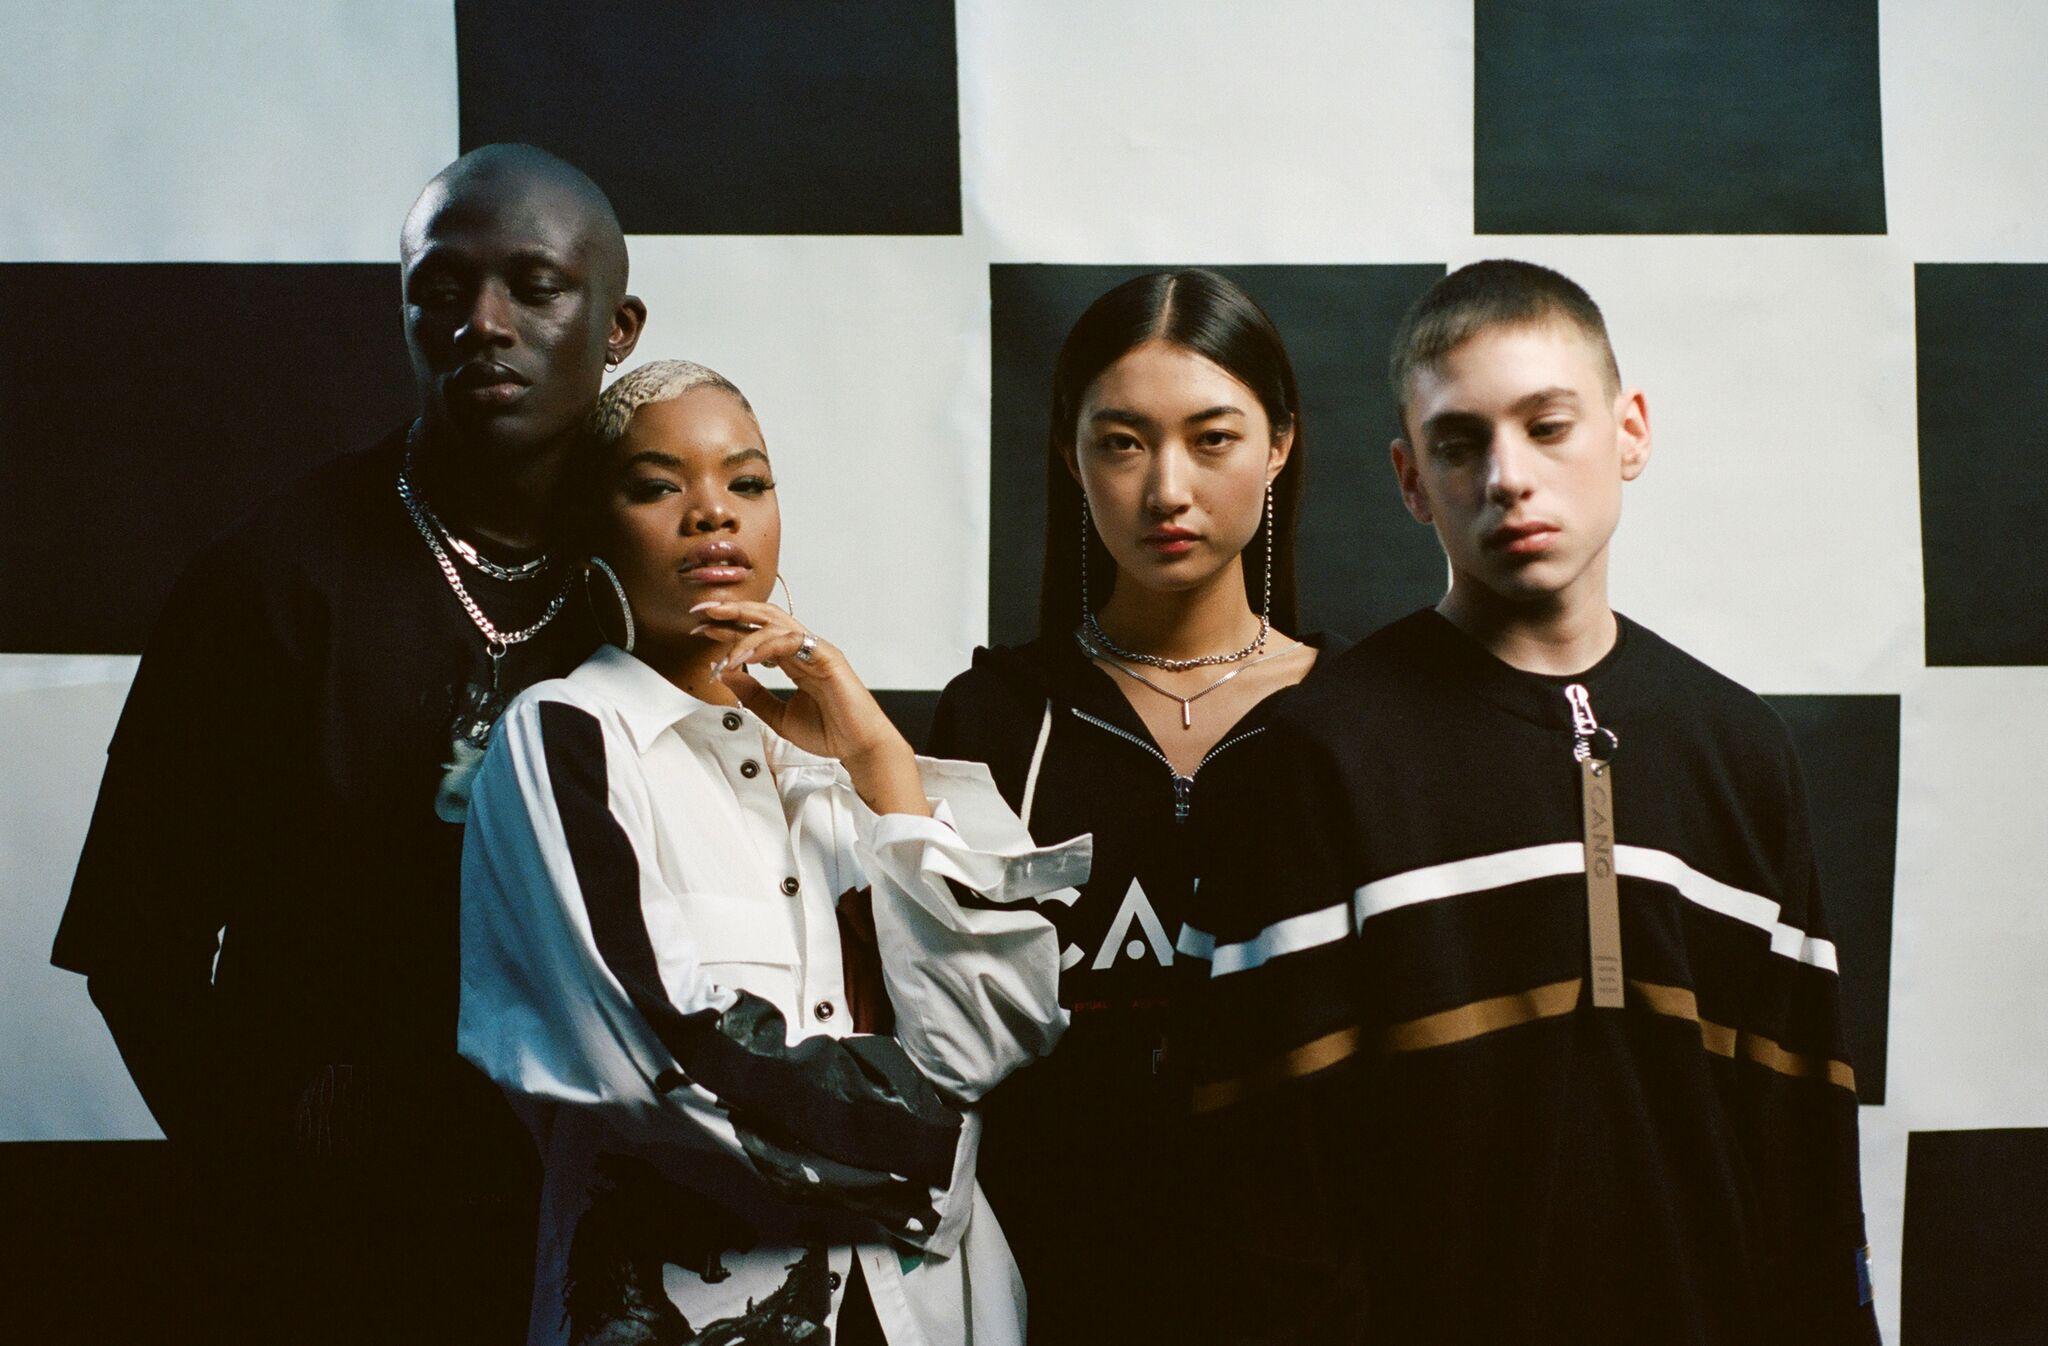 Photography: Joshua Osborne    Models: Abdourahman Njie, Kauai Sziraki, Tia Xiao & Clausia Deoliveira